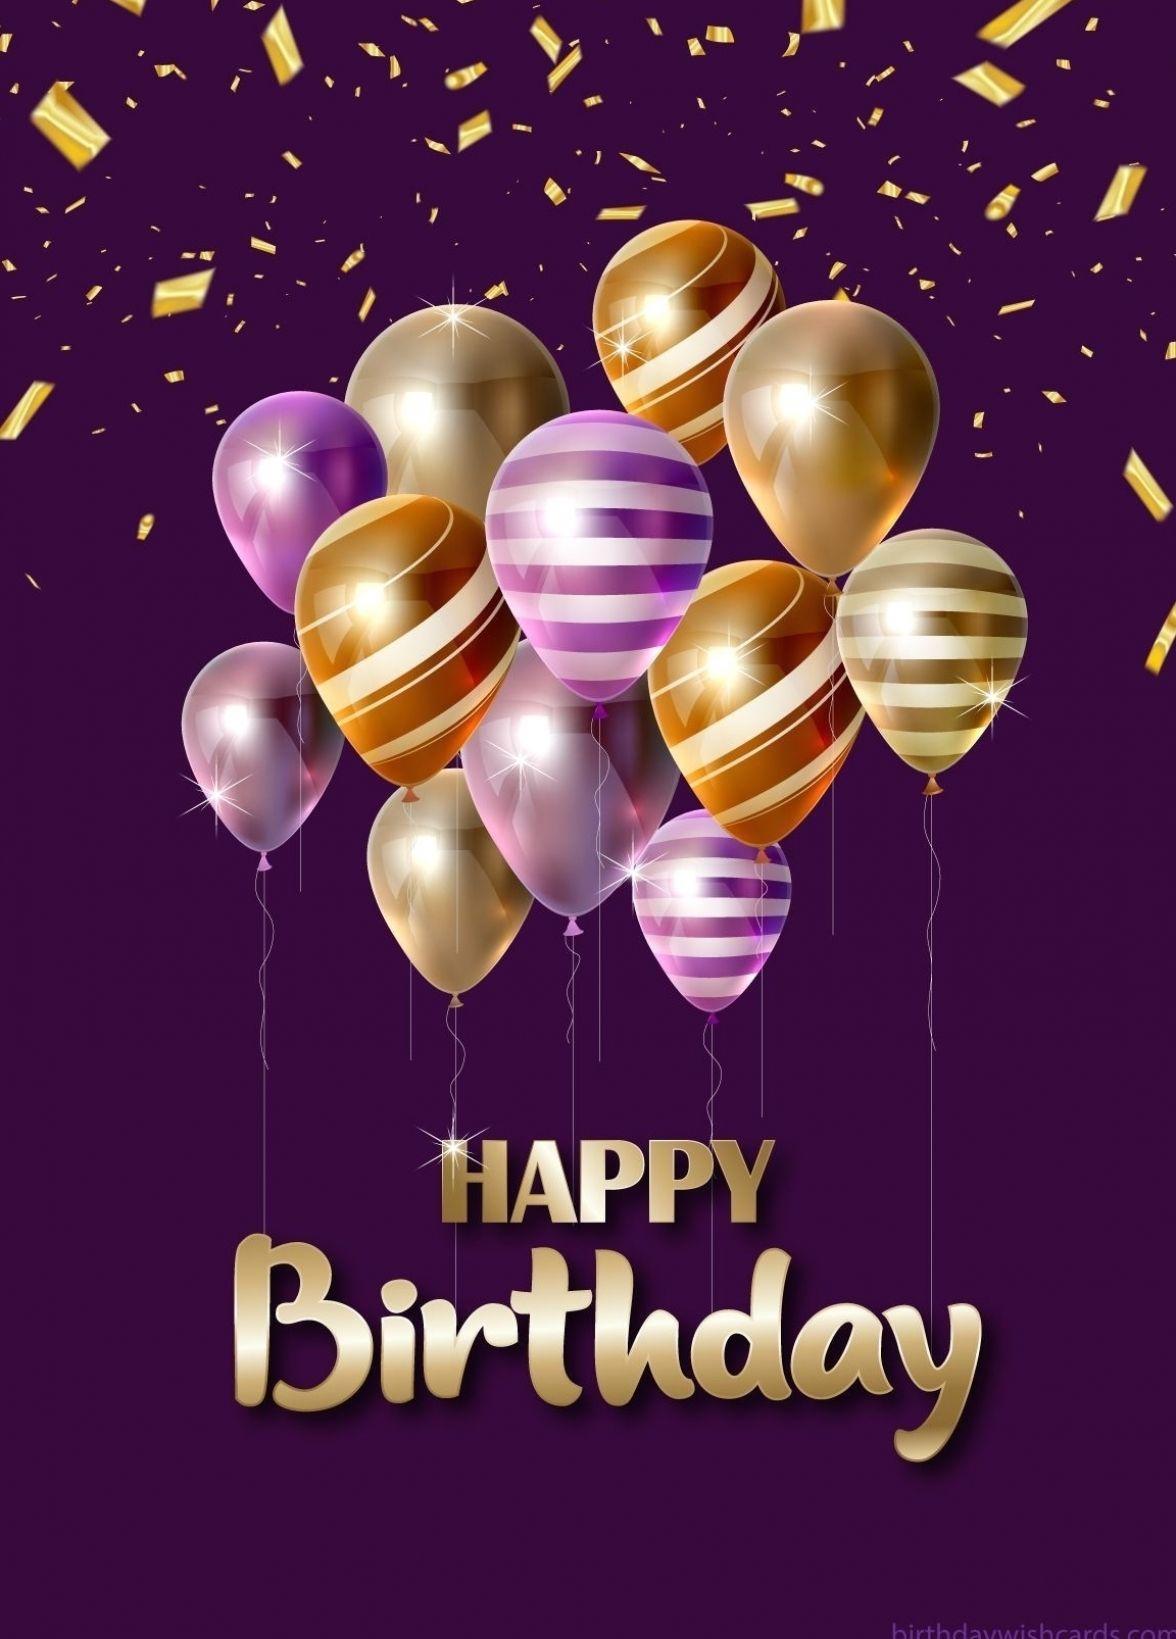 Printable Birthday Card Funny Printable Birthday Card Downloadable Birthday Card Digital Birthday Card Instant Download Happy Birthday Wishes Cards Happy Birthday Wishes Images Birthday Wishes Flowers